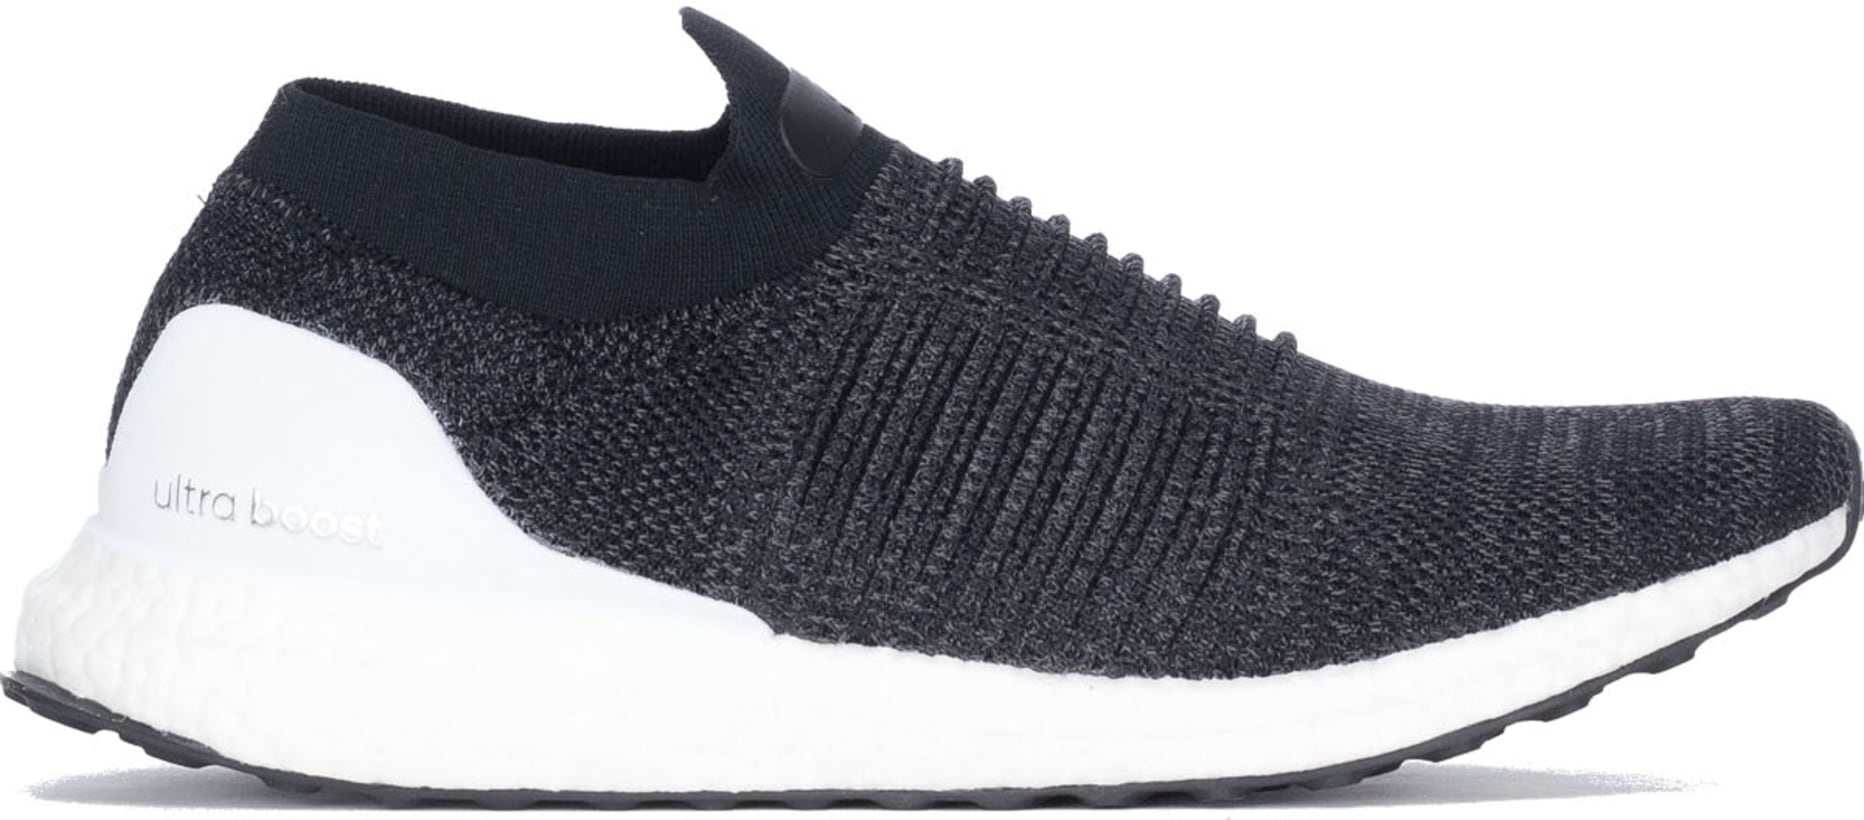 new style f4115 3c778 adidas Originals. UltraBOOST Laceless - Core Black Footwear White